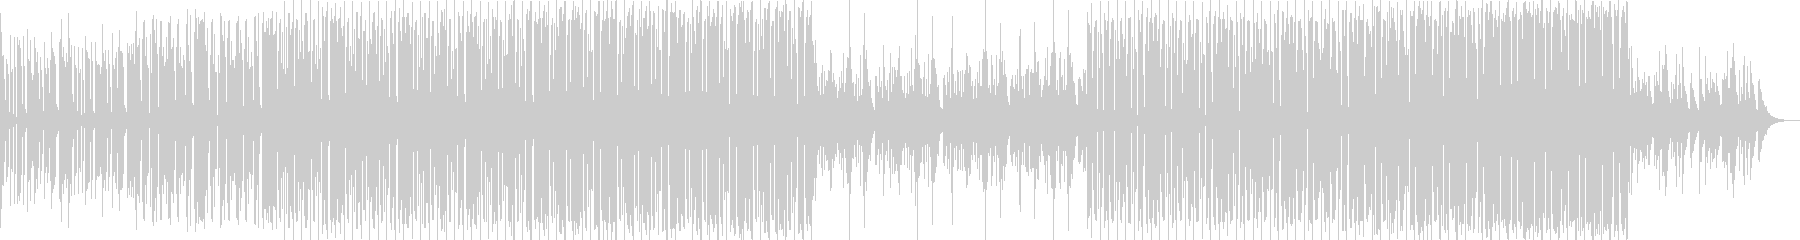 bpm116-あなたに夢中な情熱のEDMの未再生の波形